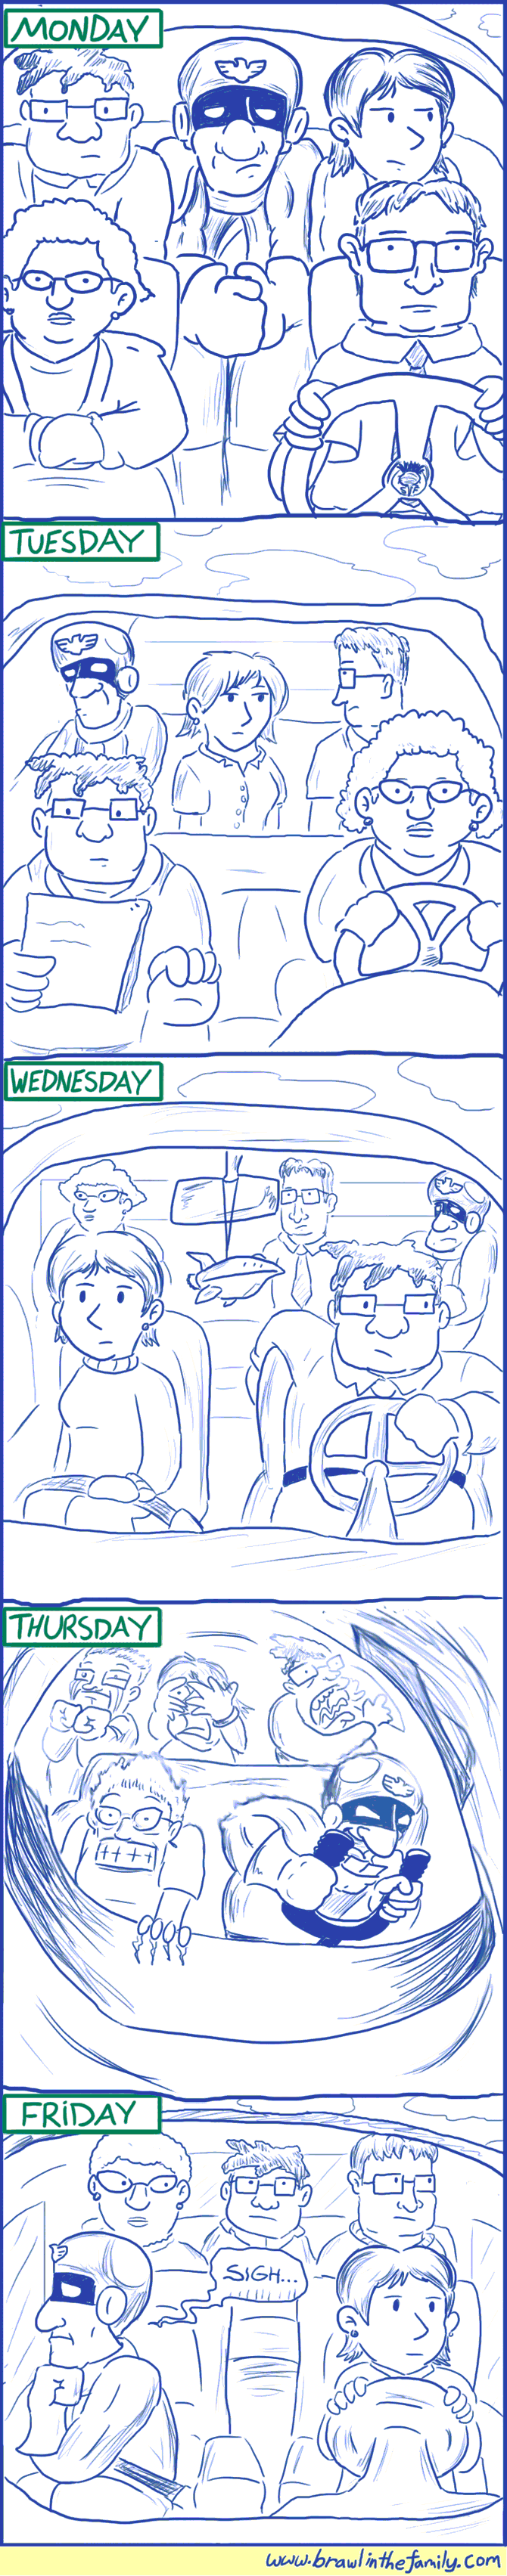 158 – Captain Falcon Carpools to Work